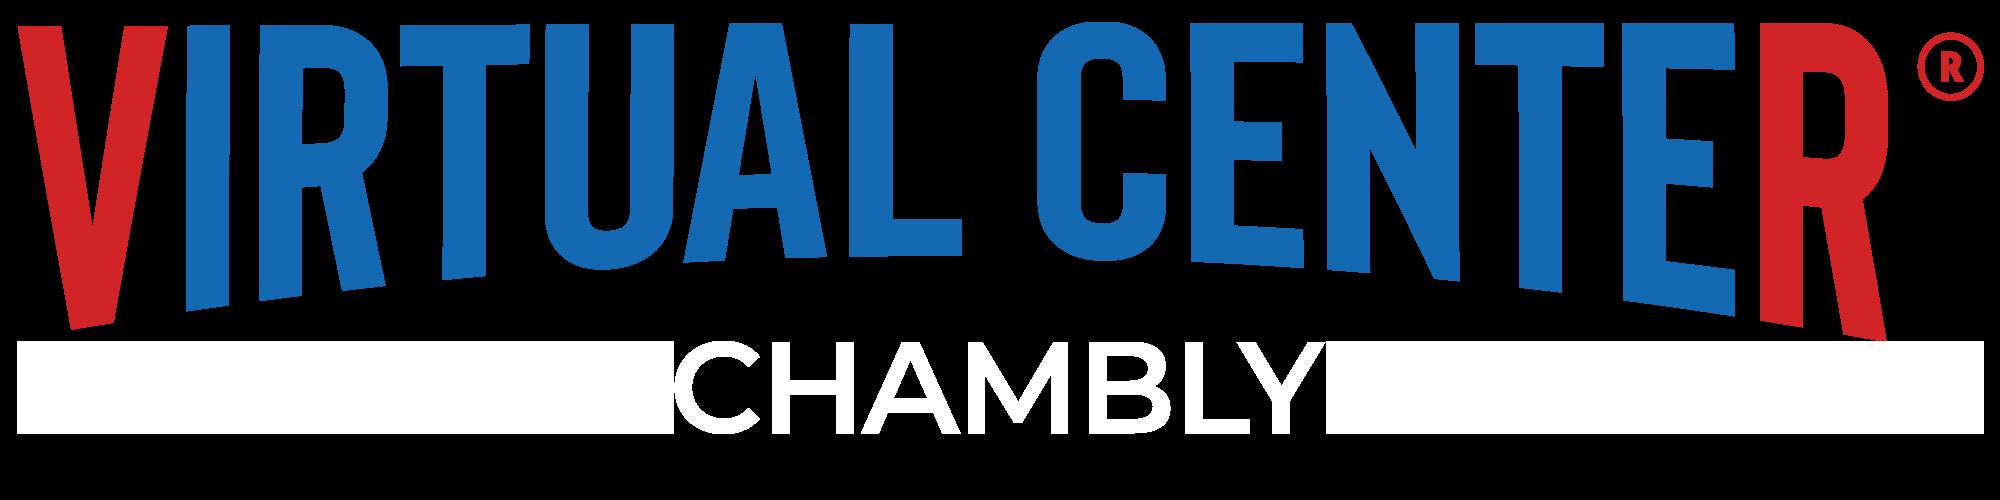 Virtual Center Chambly